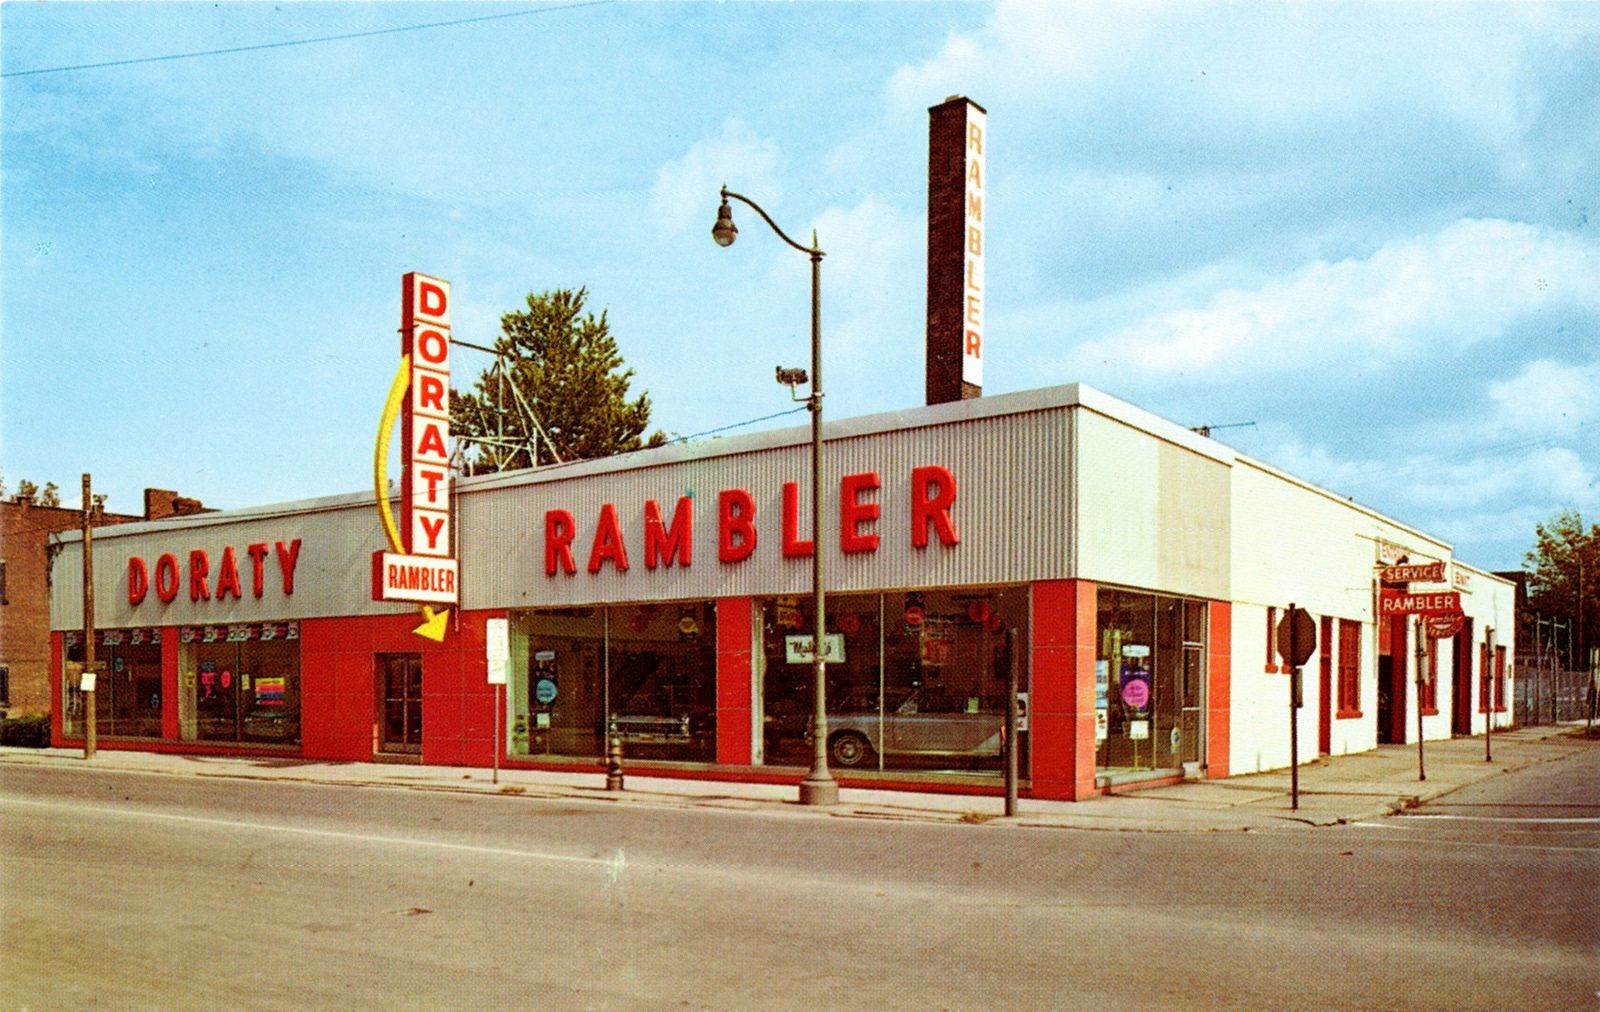 Doraty Rambler, Inc. Cleveland OH, 1966 Cleveland